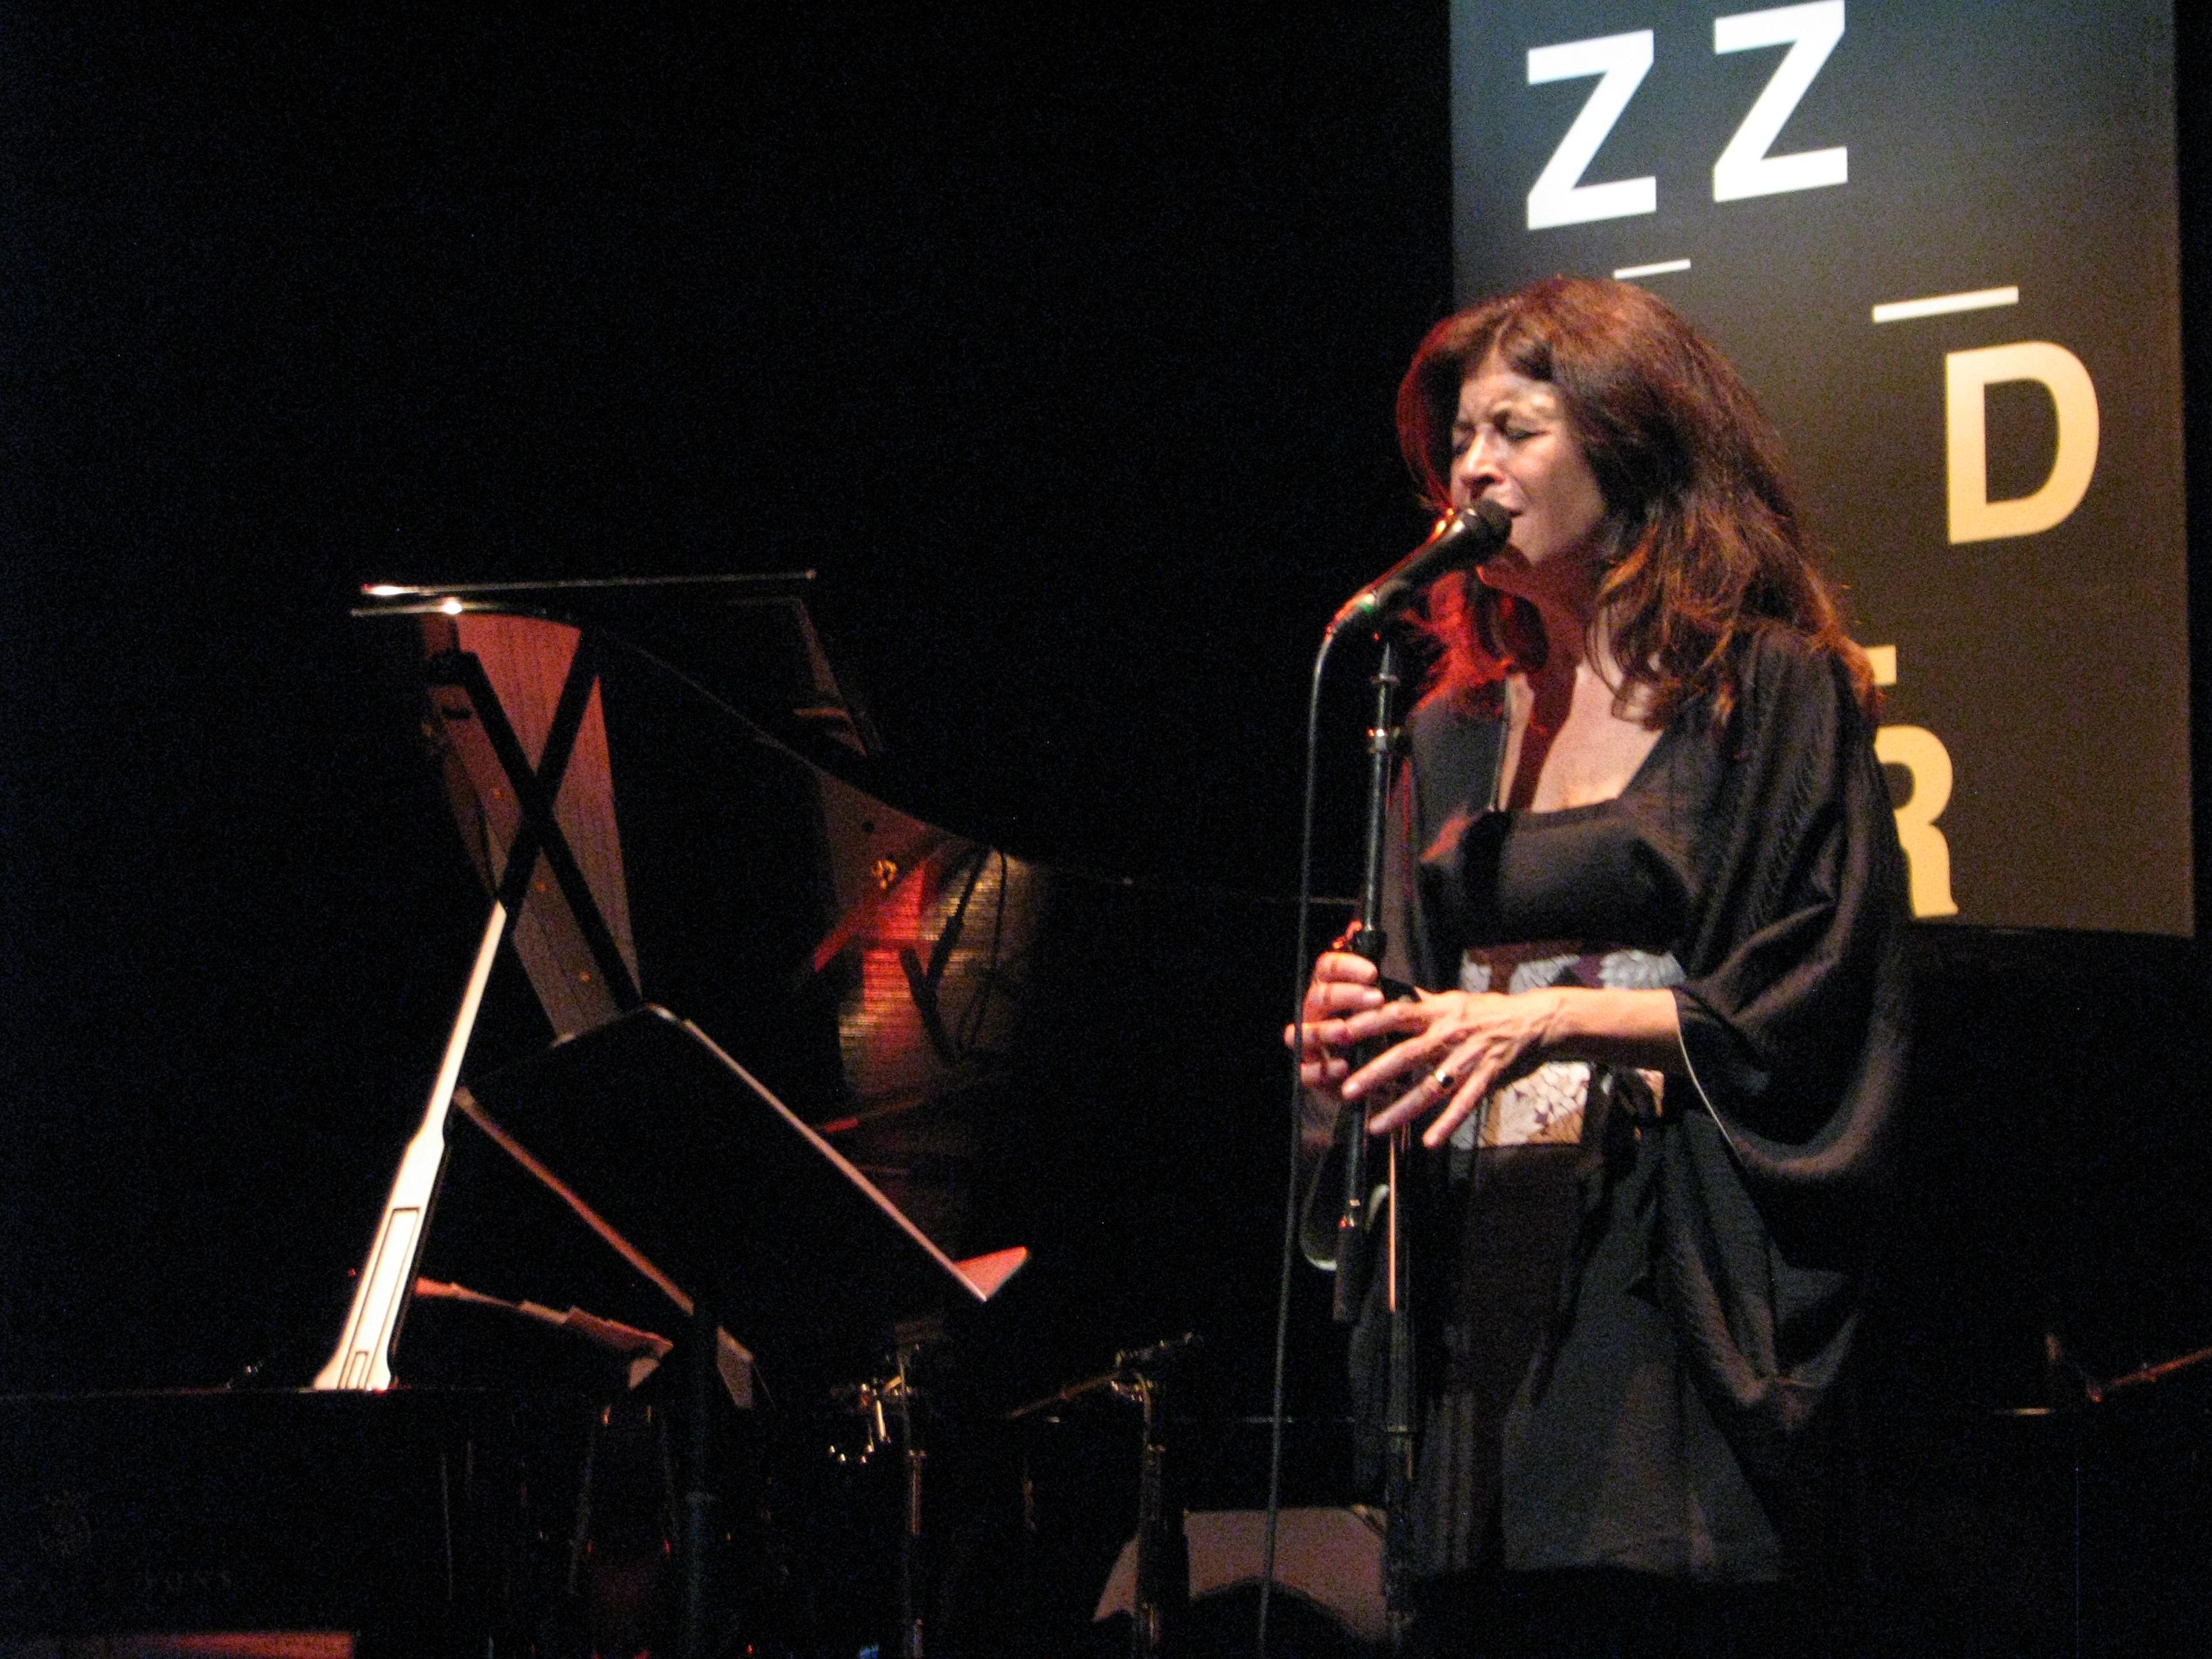 Maria Pia De Vito Jazzdor Strasbourg 2015